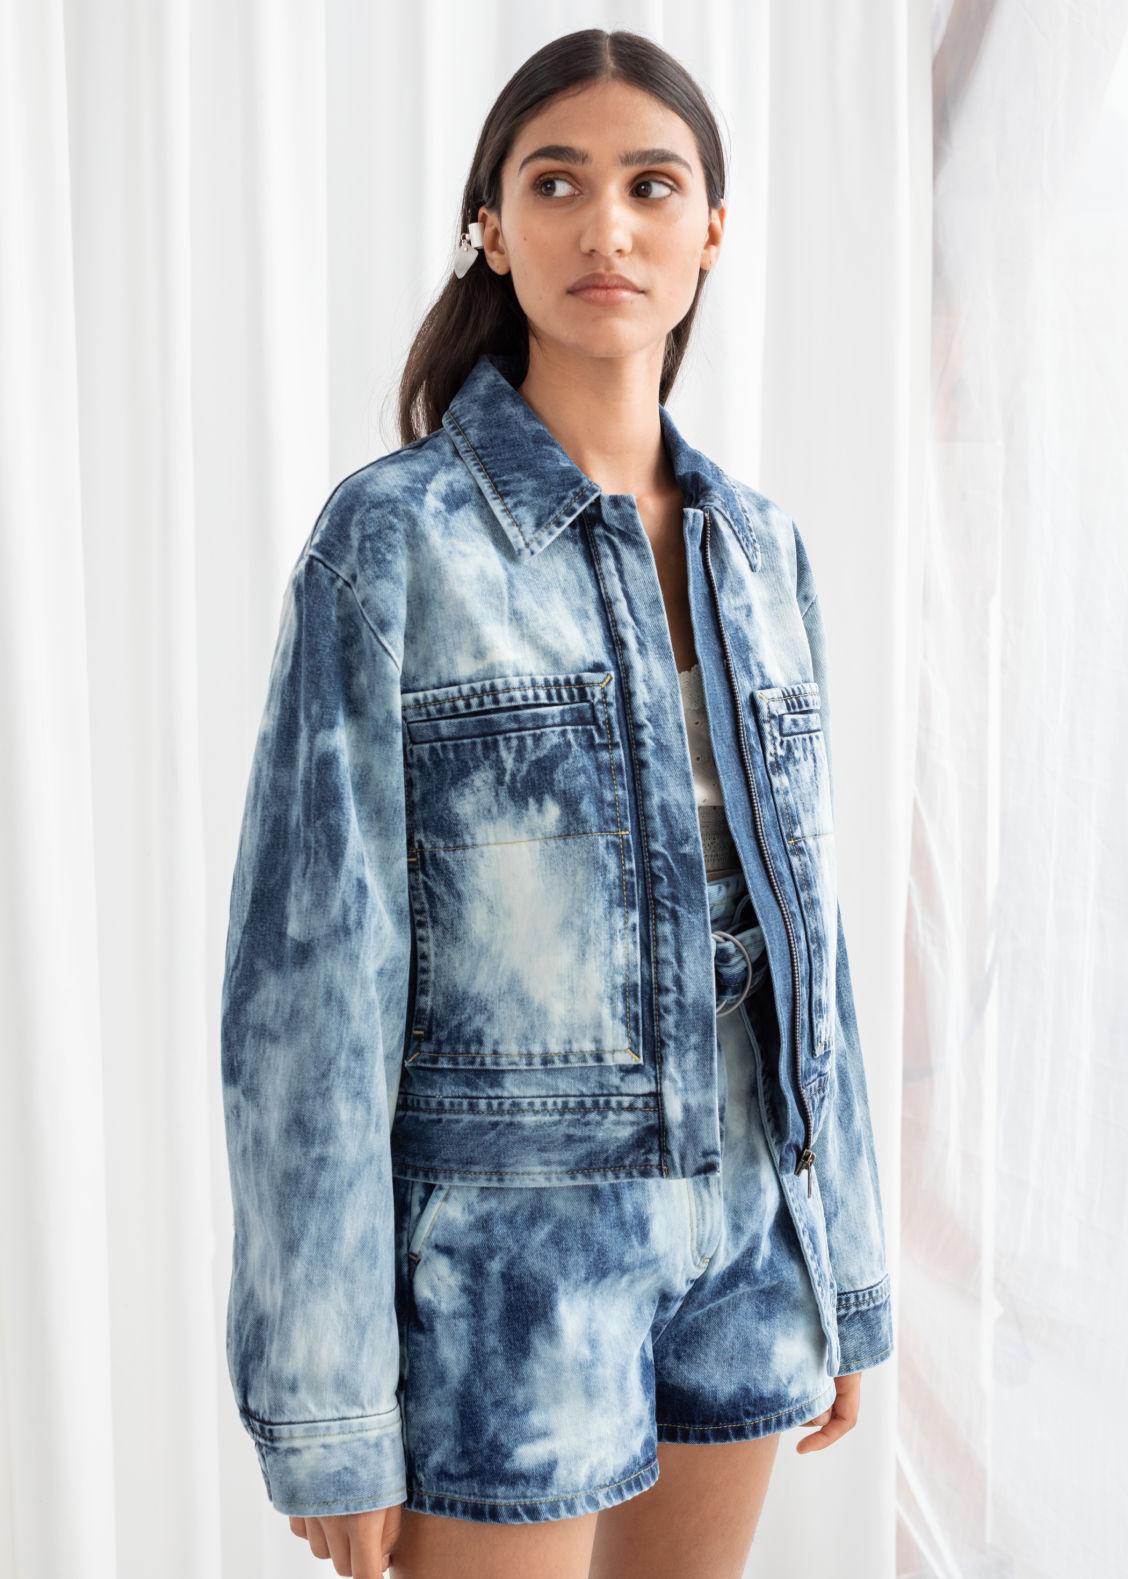 7f1e27d7f Tie Dye Organic Cotton Denim Jacket - Tie Dye - Denimjackets - & Other  Stories